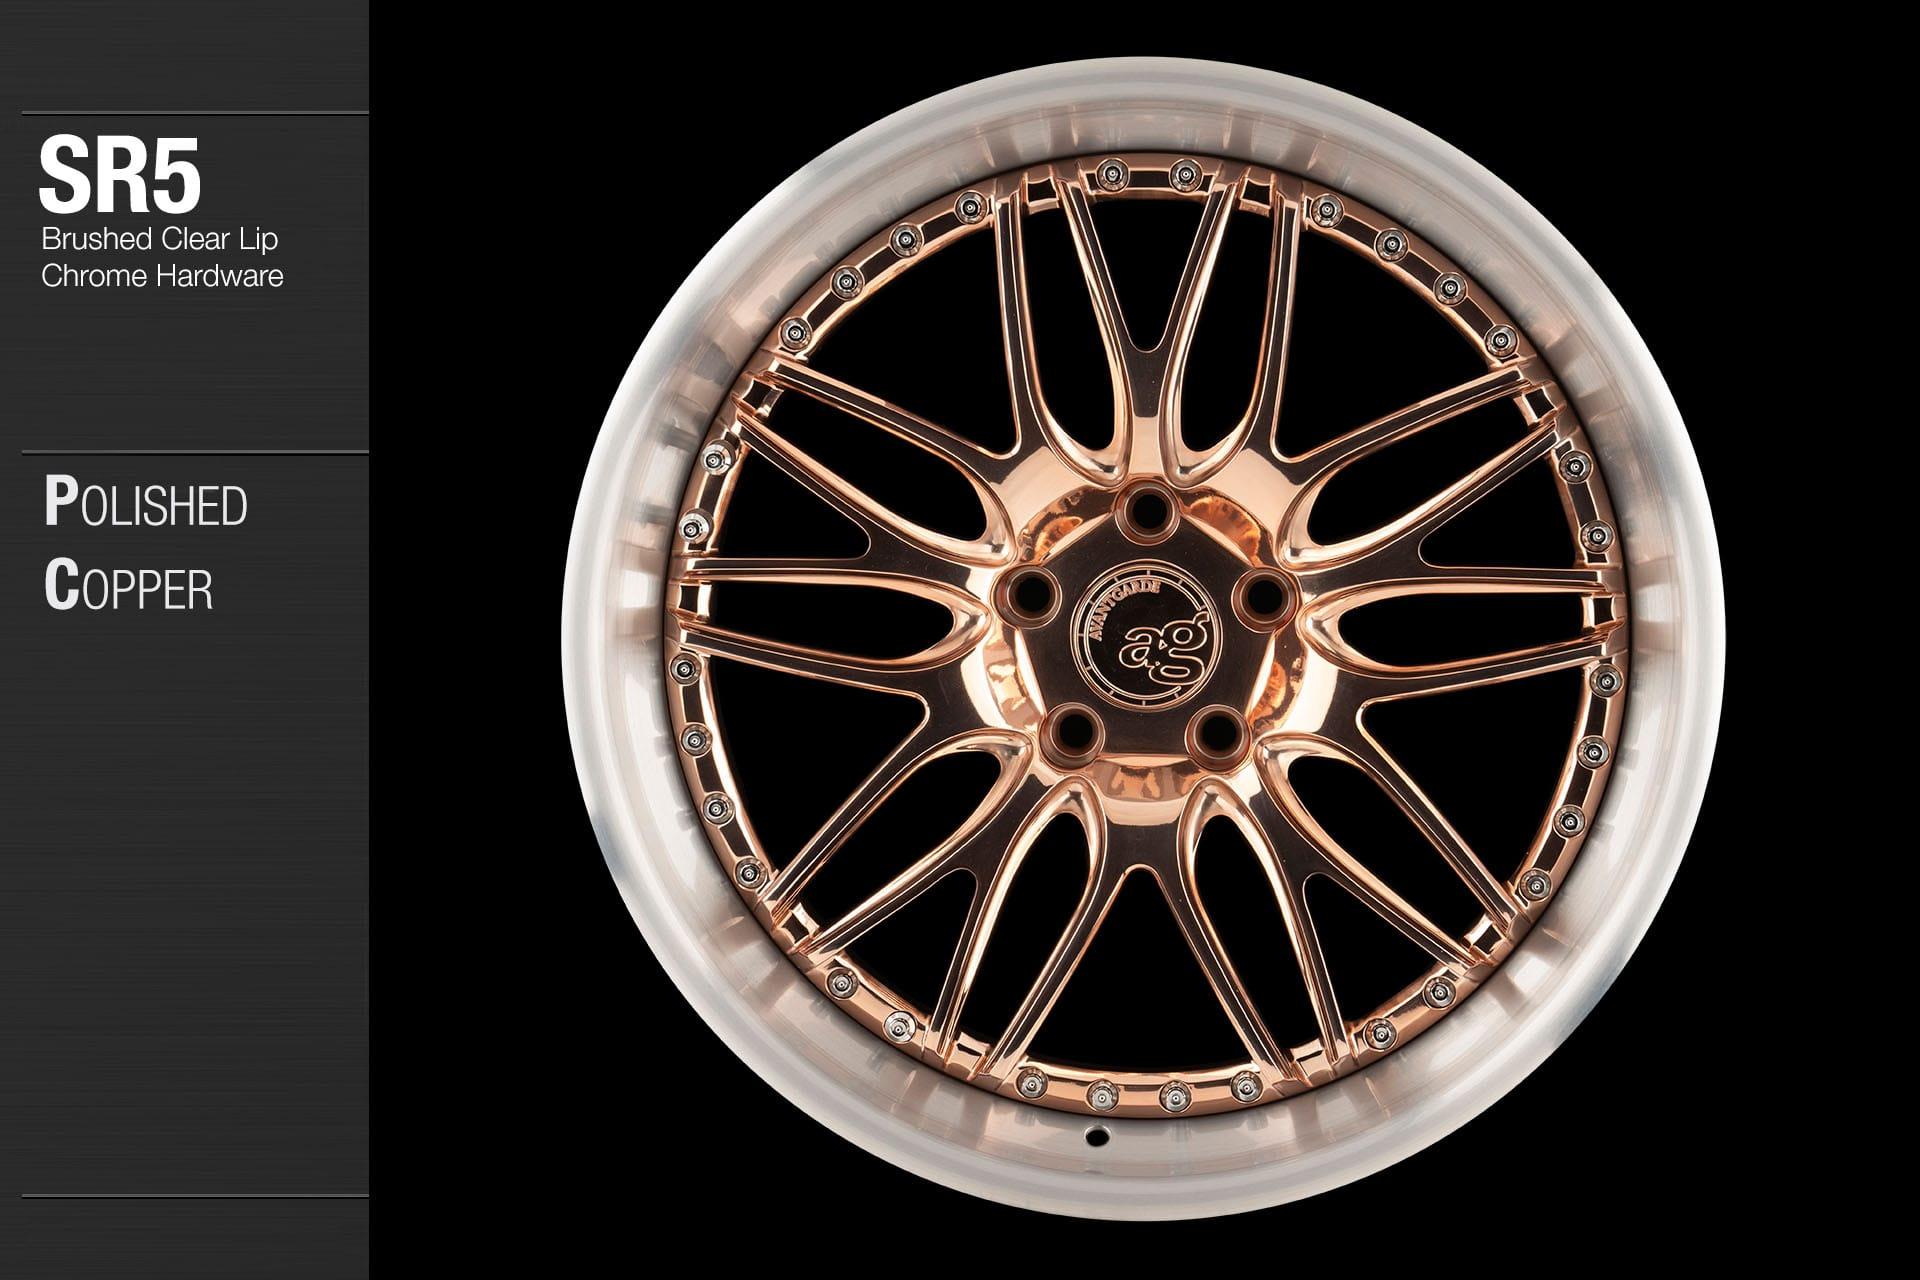 avant-garde-ag-wheels-sr5-polished-copper-face-brushed-clear-lip-chrome-hardware-1